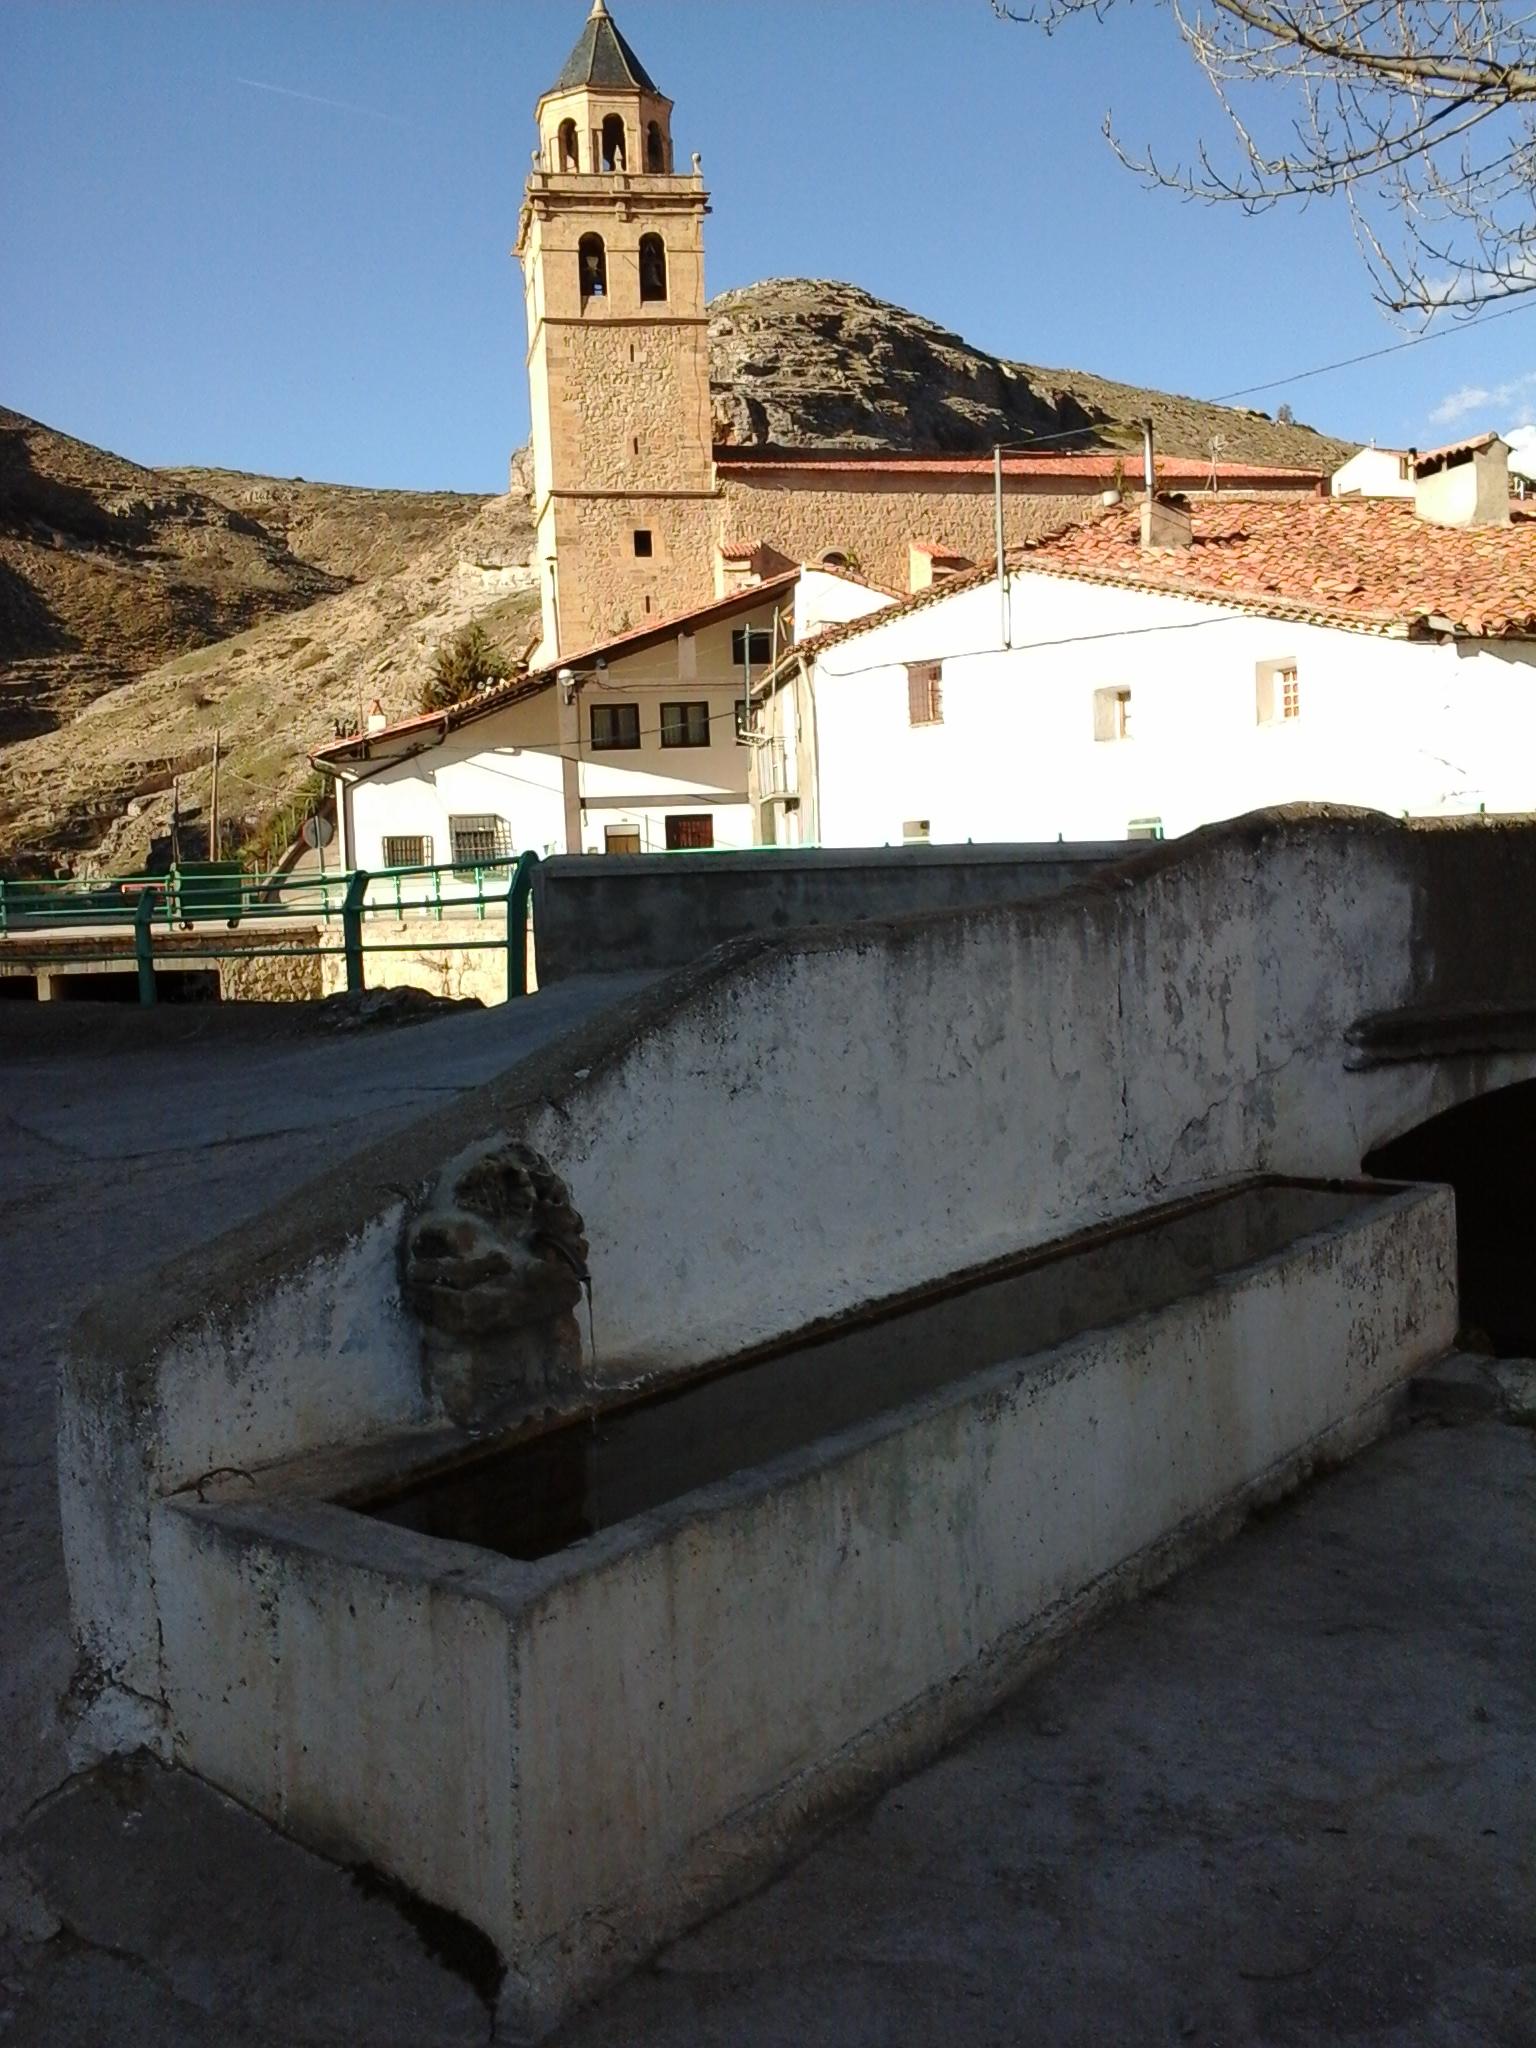 VIL_06_A. Linares_ANTANICA 1